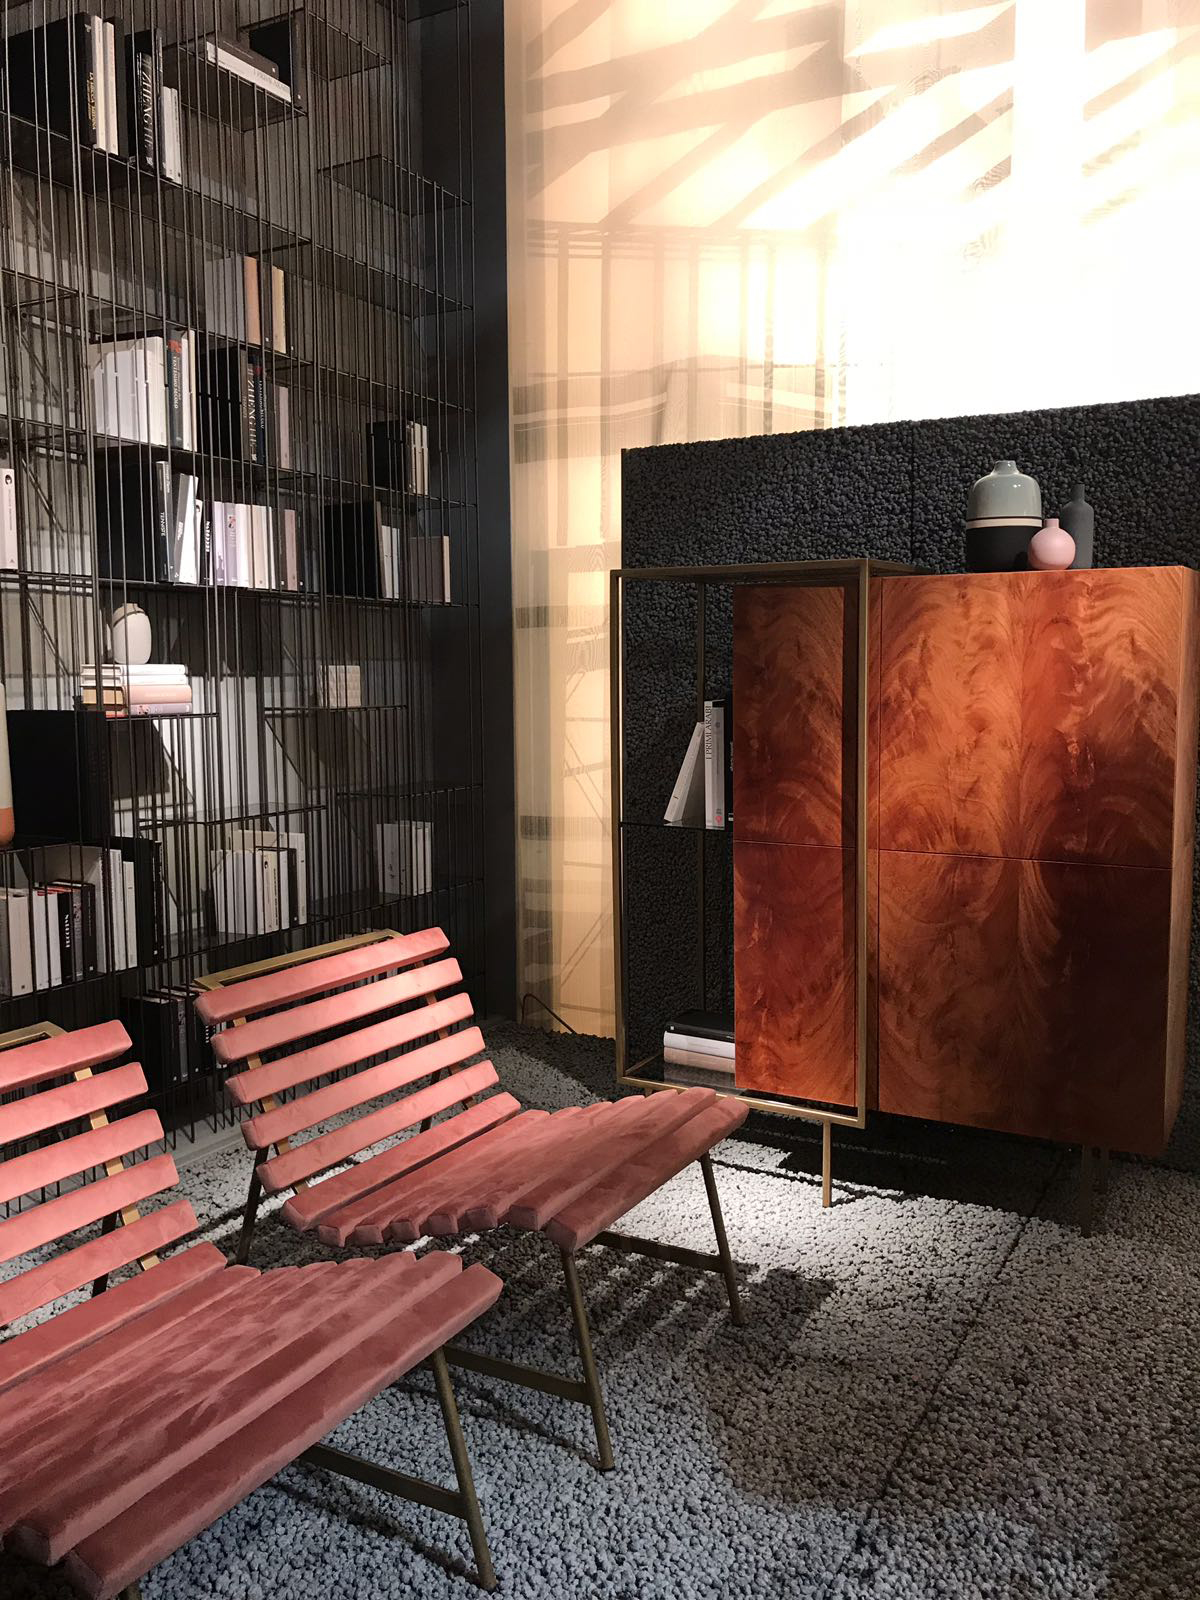 A_LONDON_Salone_del_Mobile_Milan_Design_Week_07.jpg